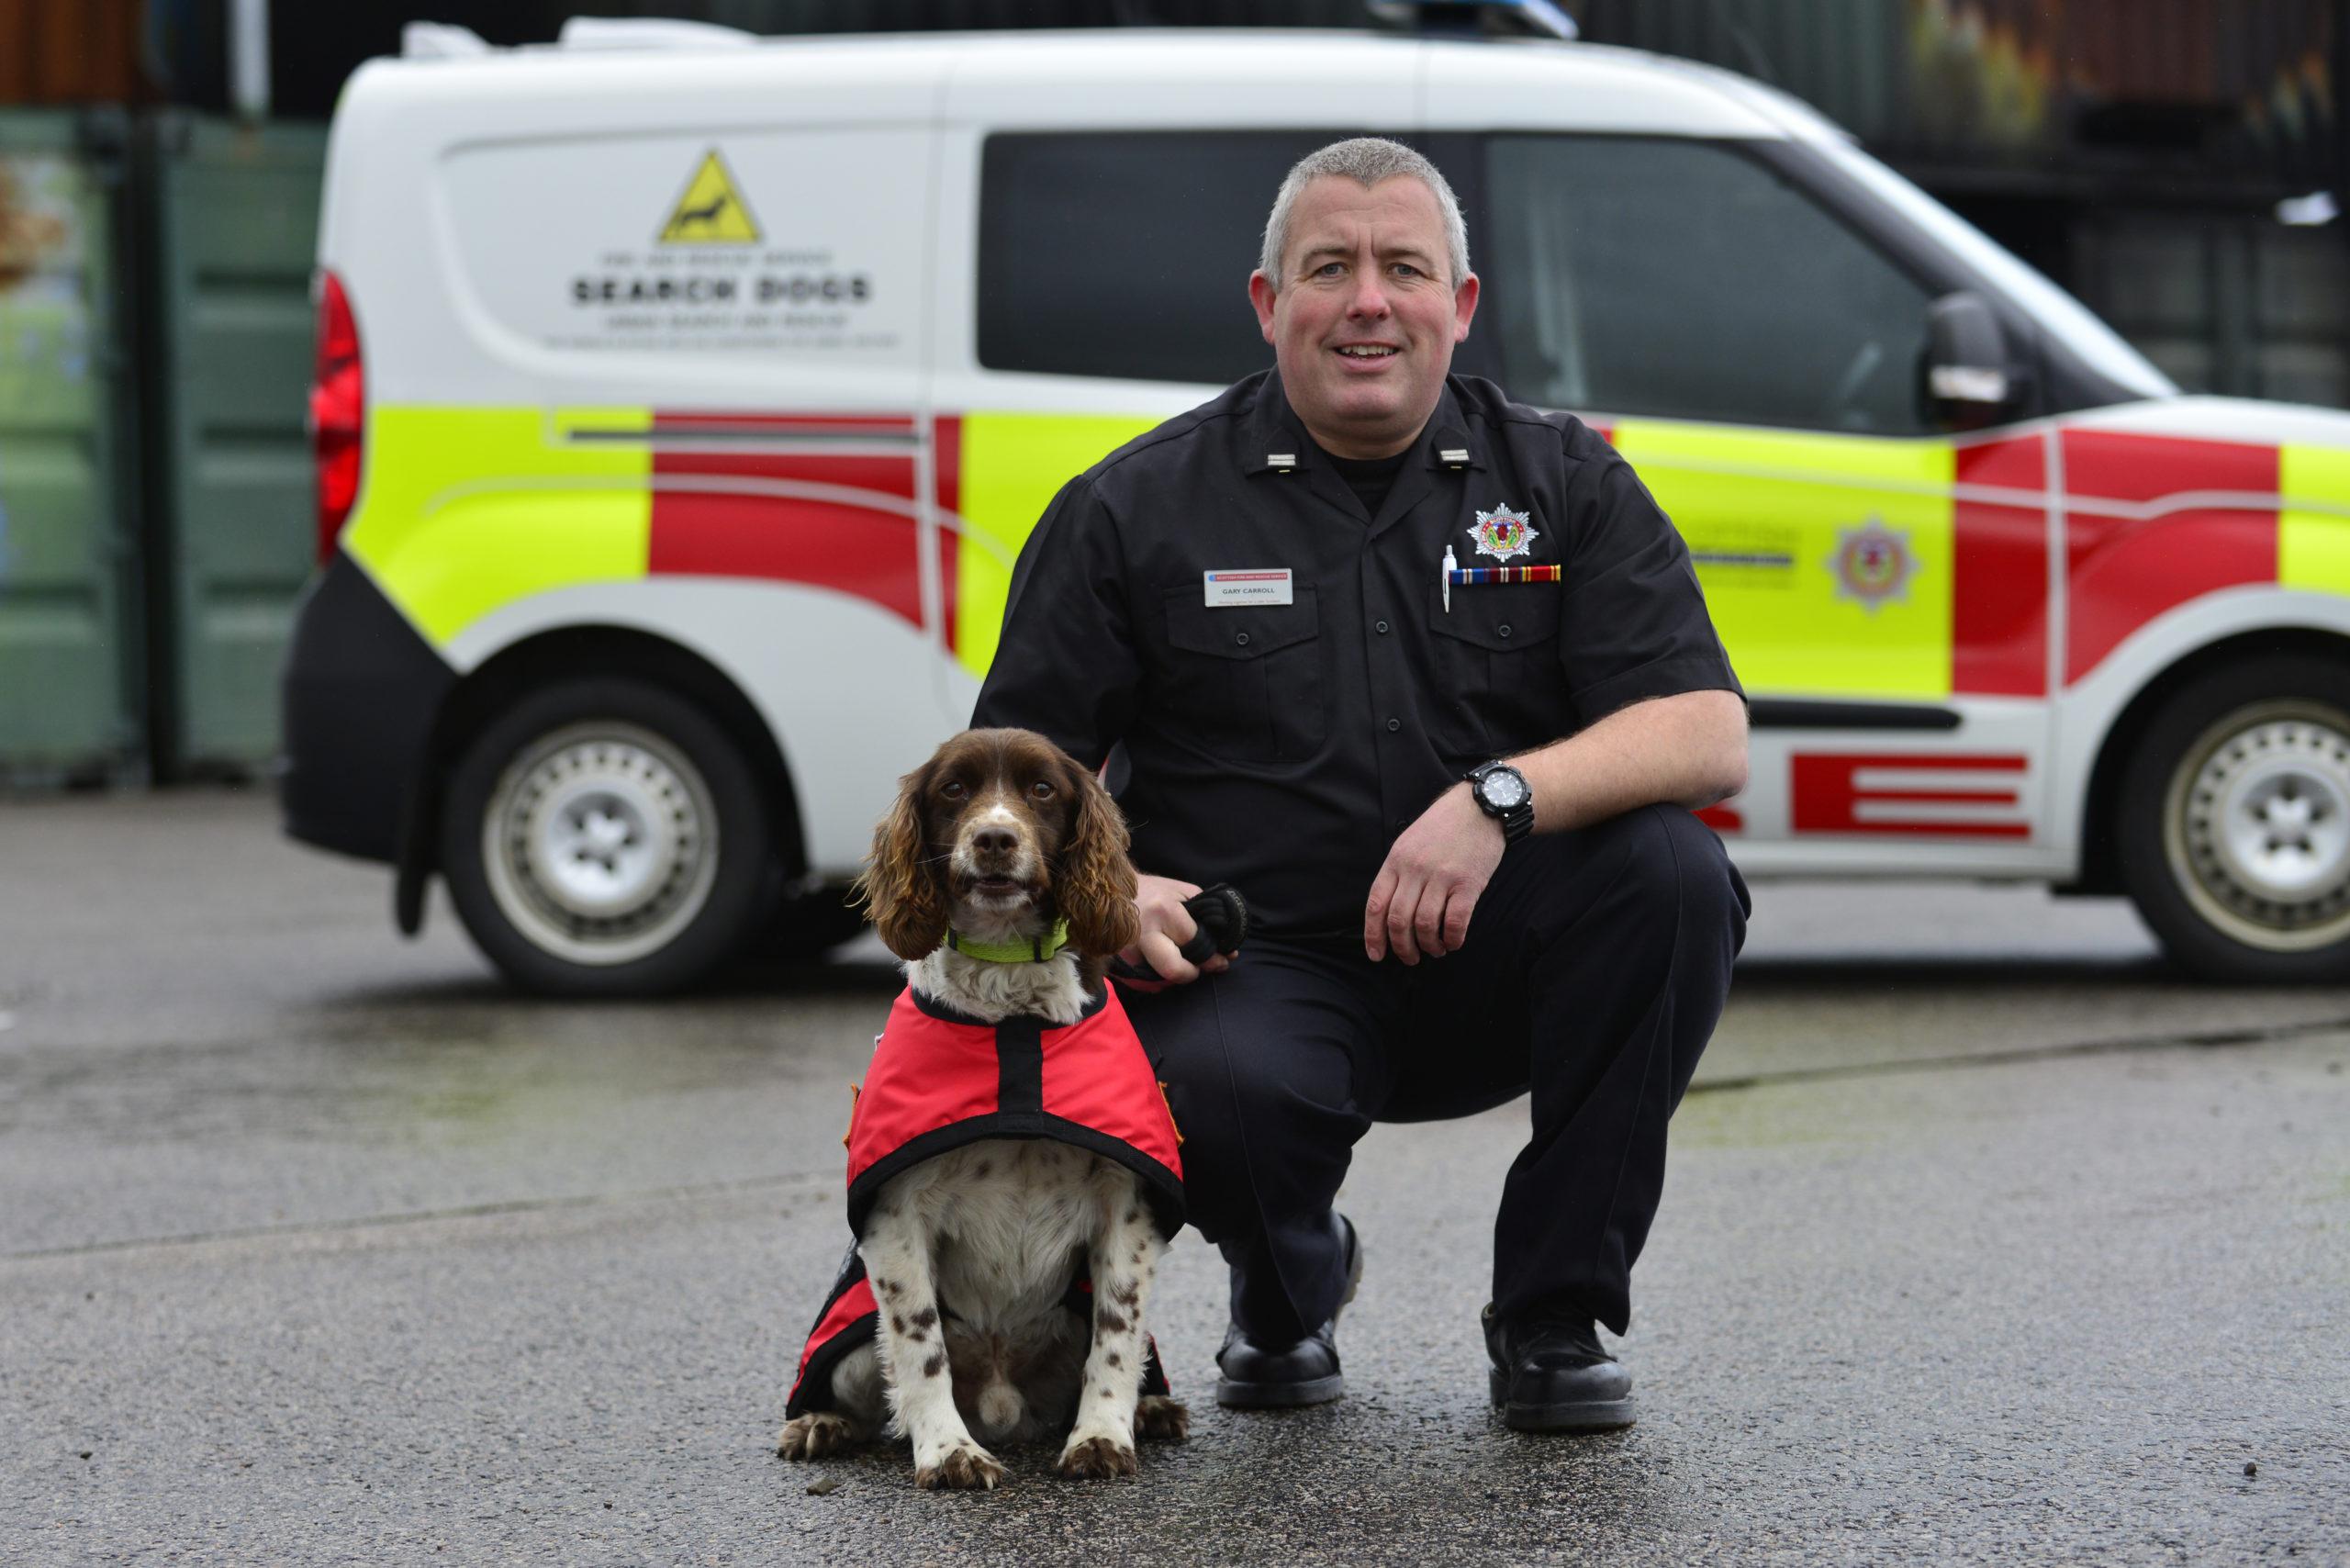 Rescue dog Diesel and handler Gary